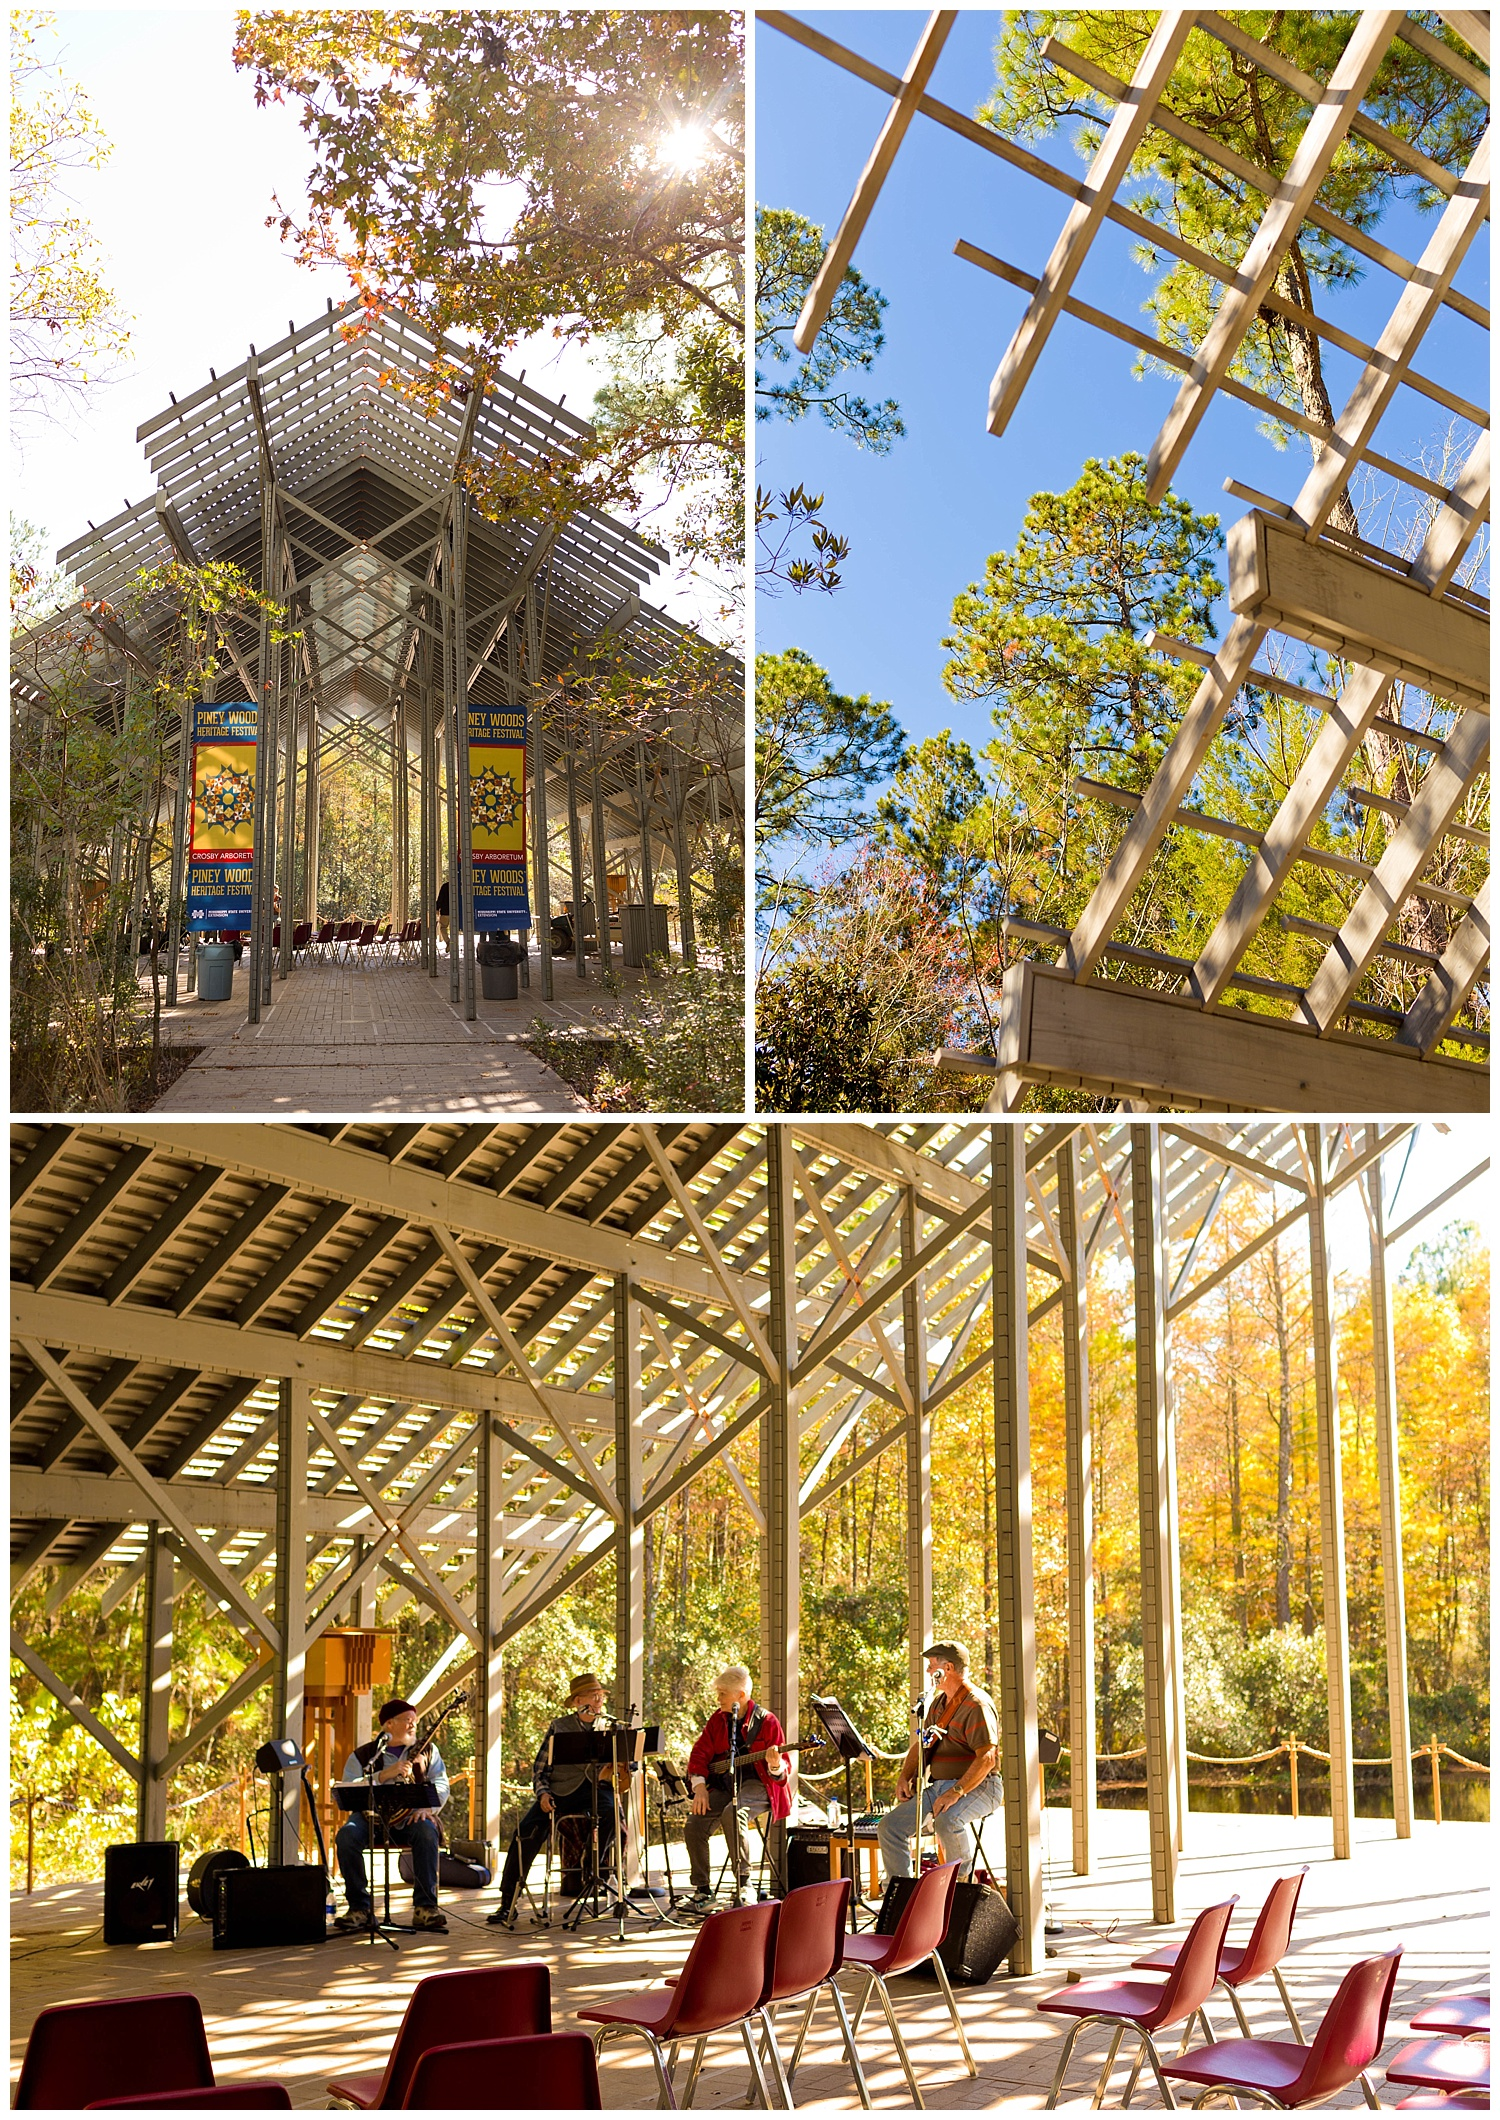 Pinecote Pavilion Crosby Arboretum (with bluegrass band)